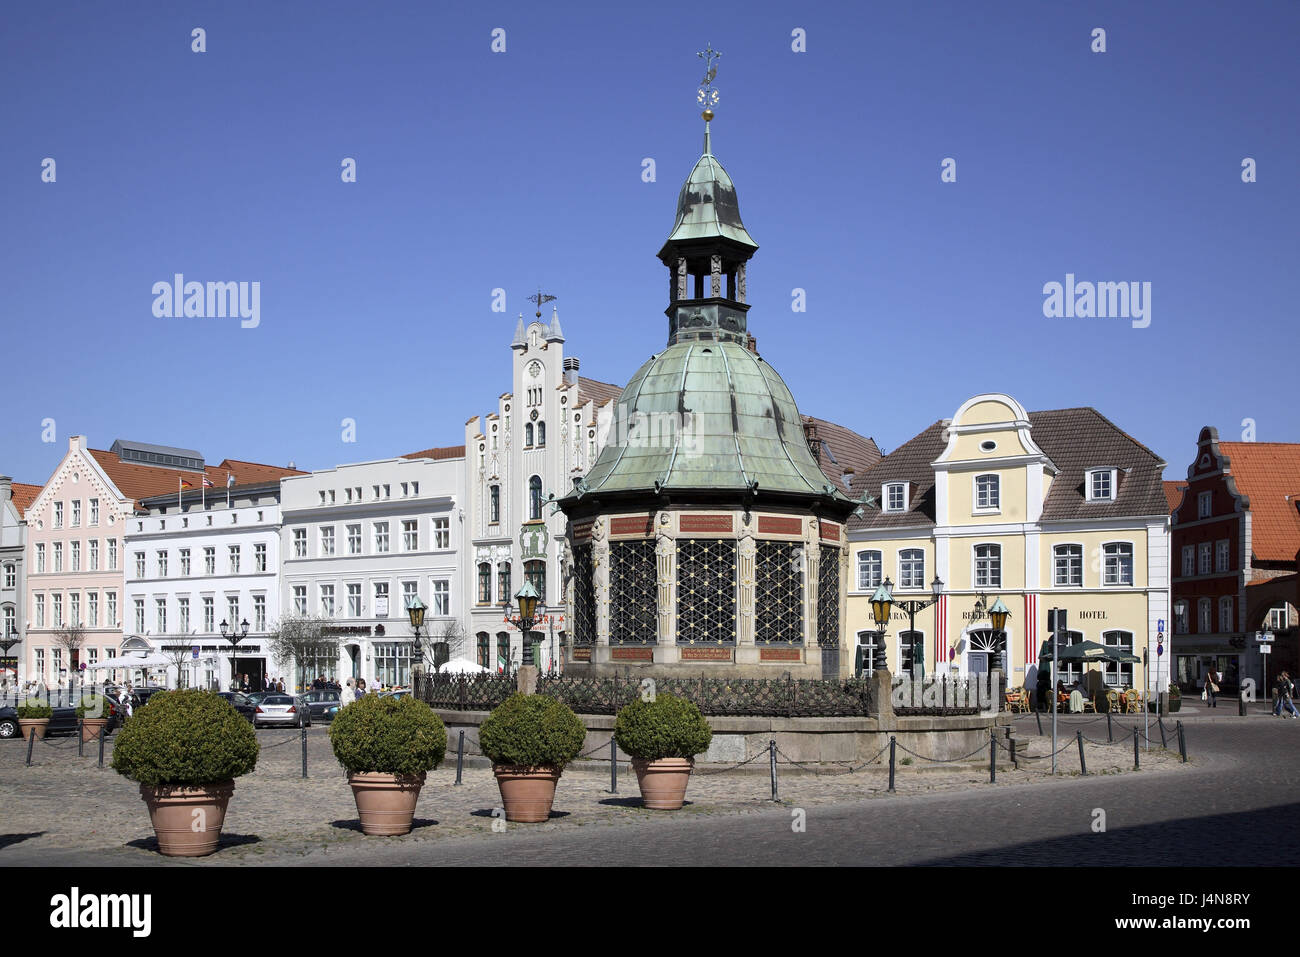 Germany, Mecklenburg-West Pomerania, Wismar, in the market, water art, - Stock Image